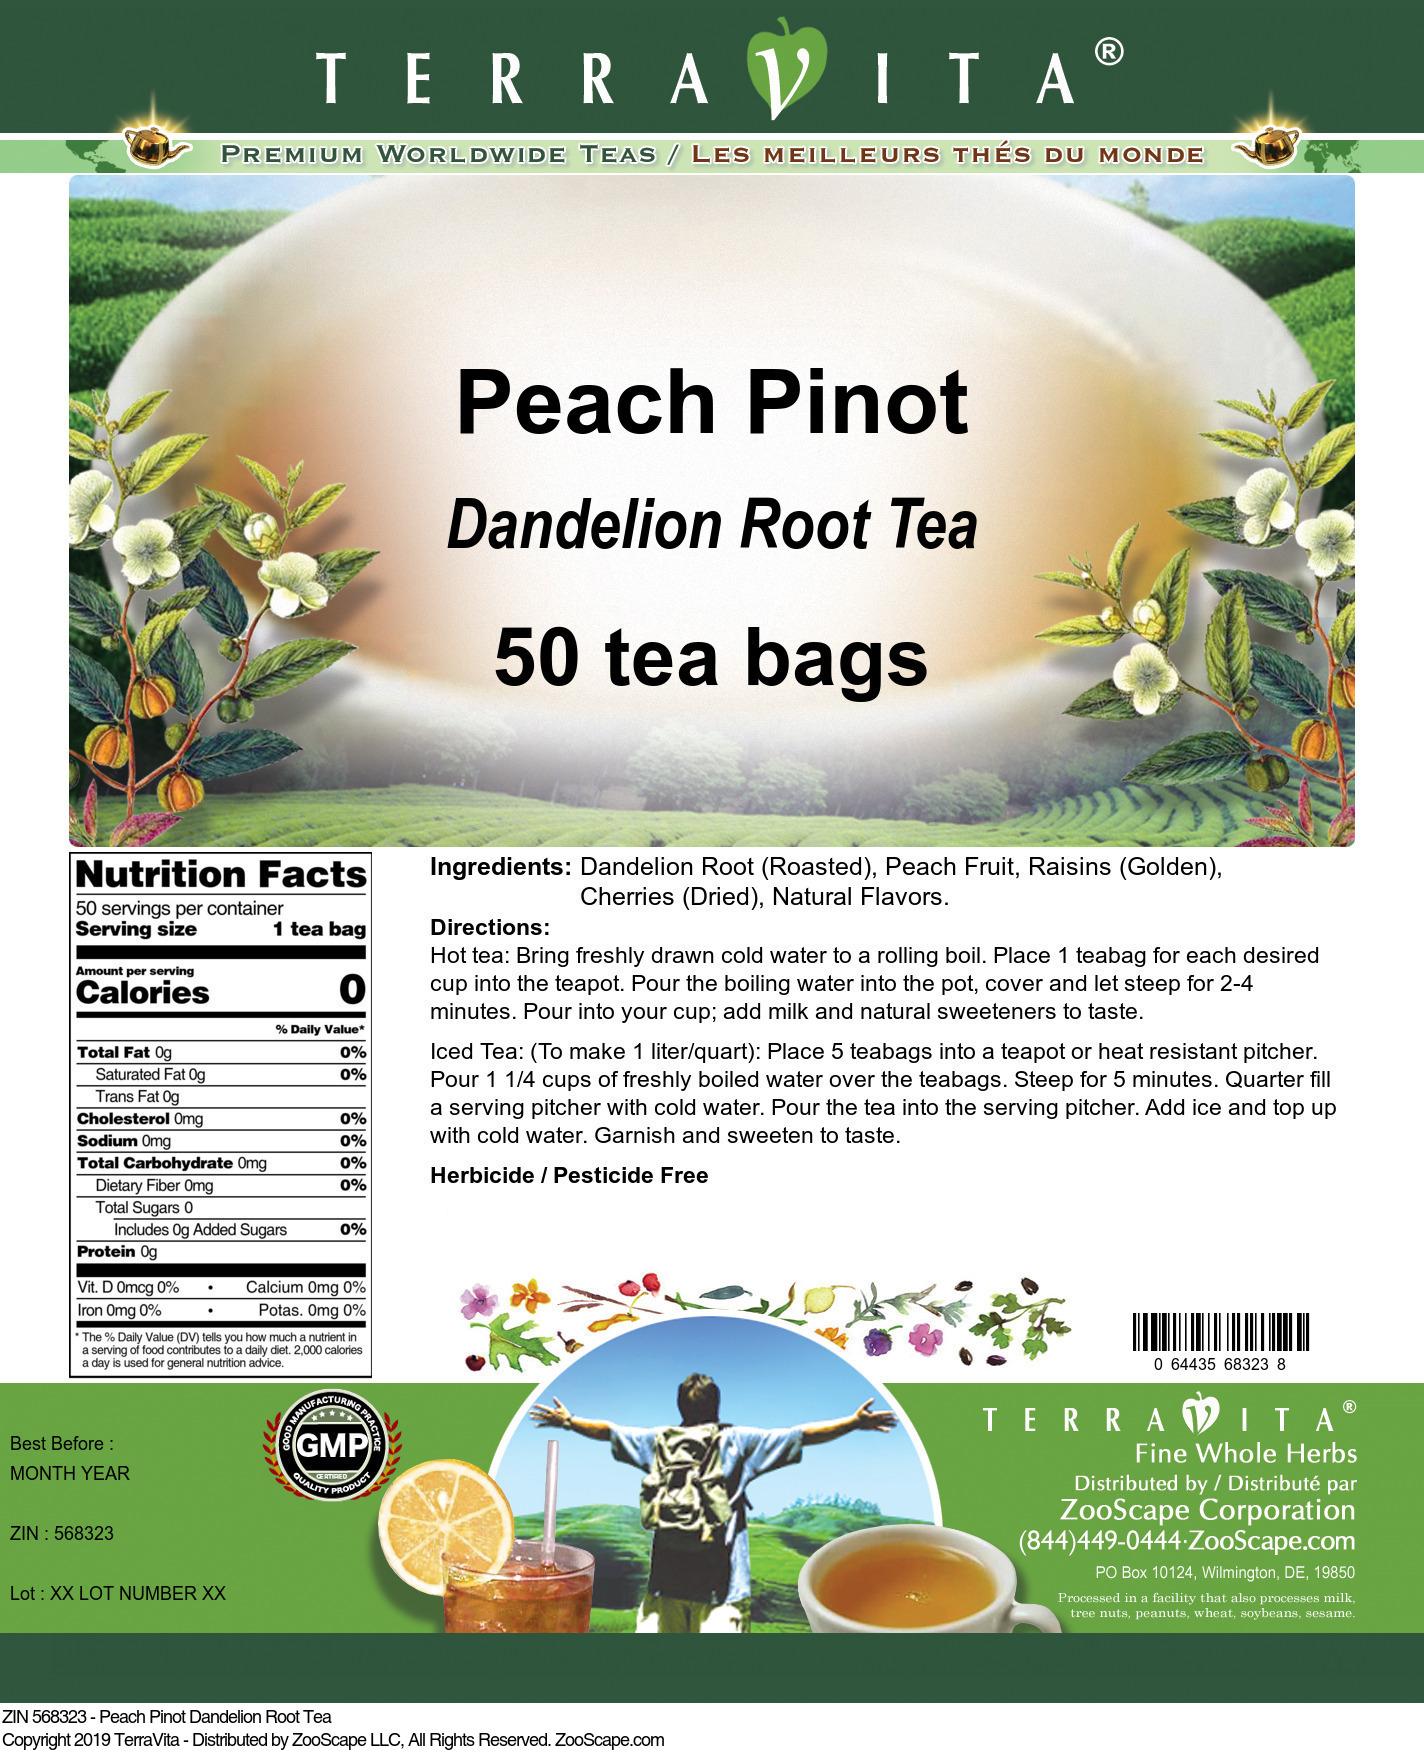 Peach Pinot Dandelion Root Tea